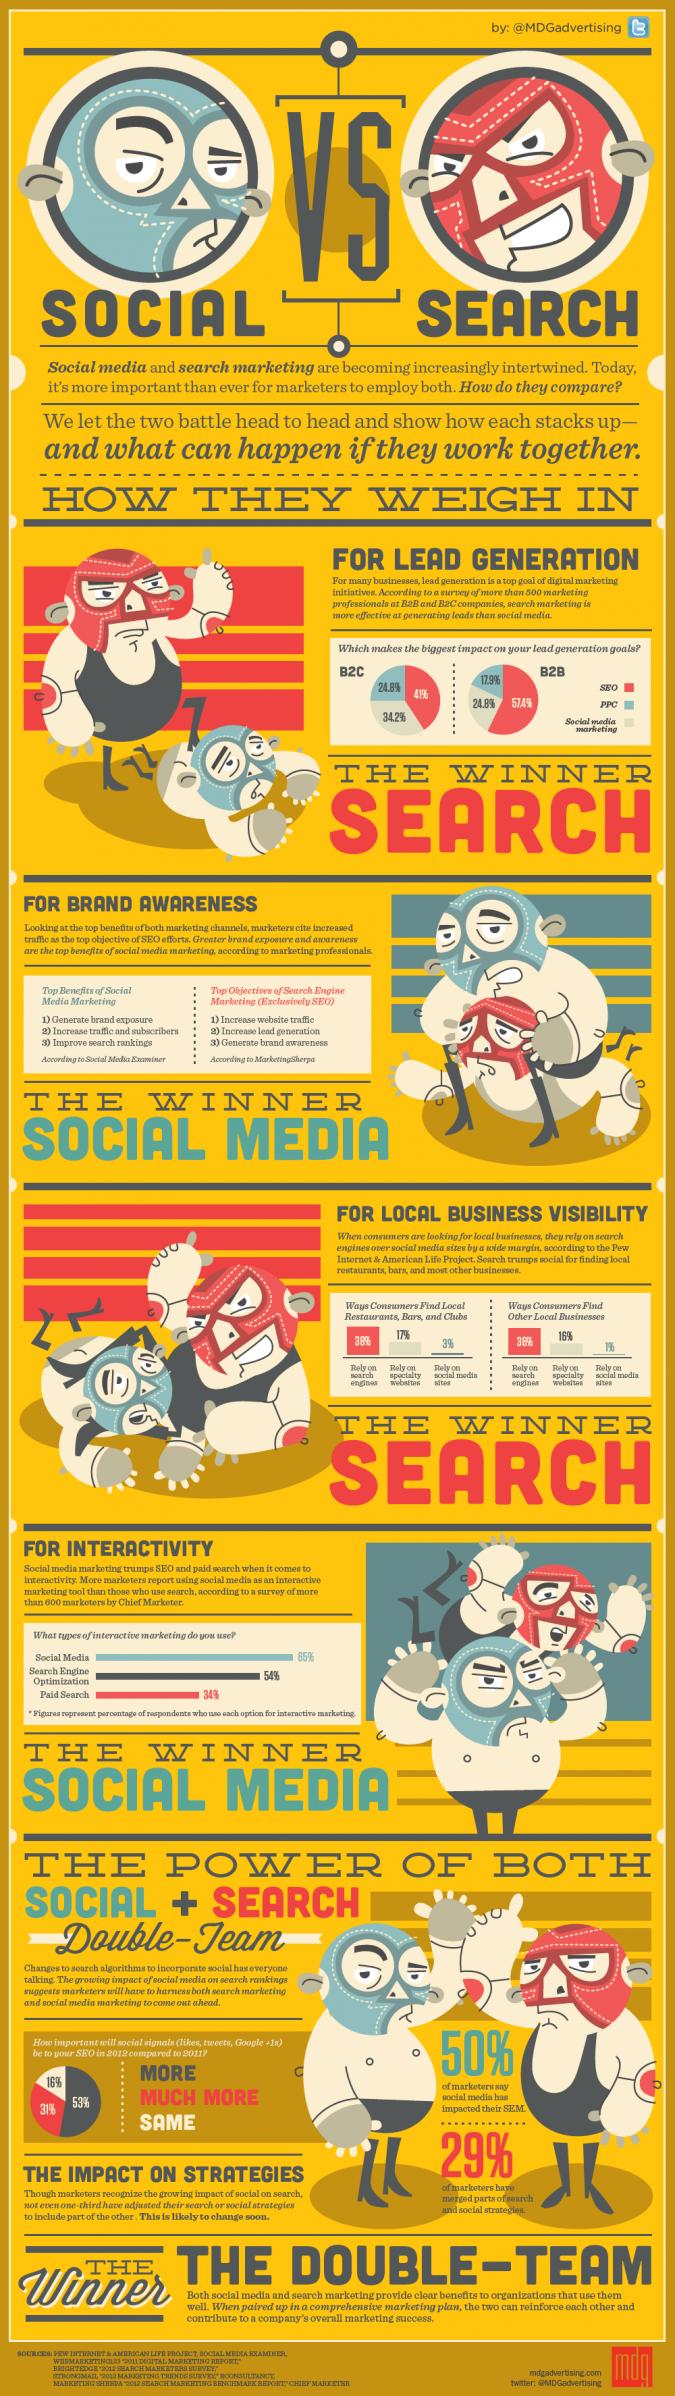 Infografik Social Media vs. Suchmaschinenoptimierung